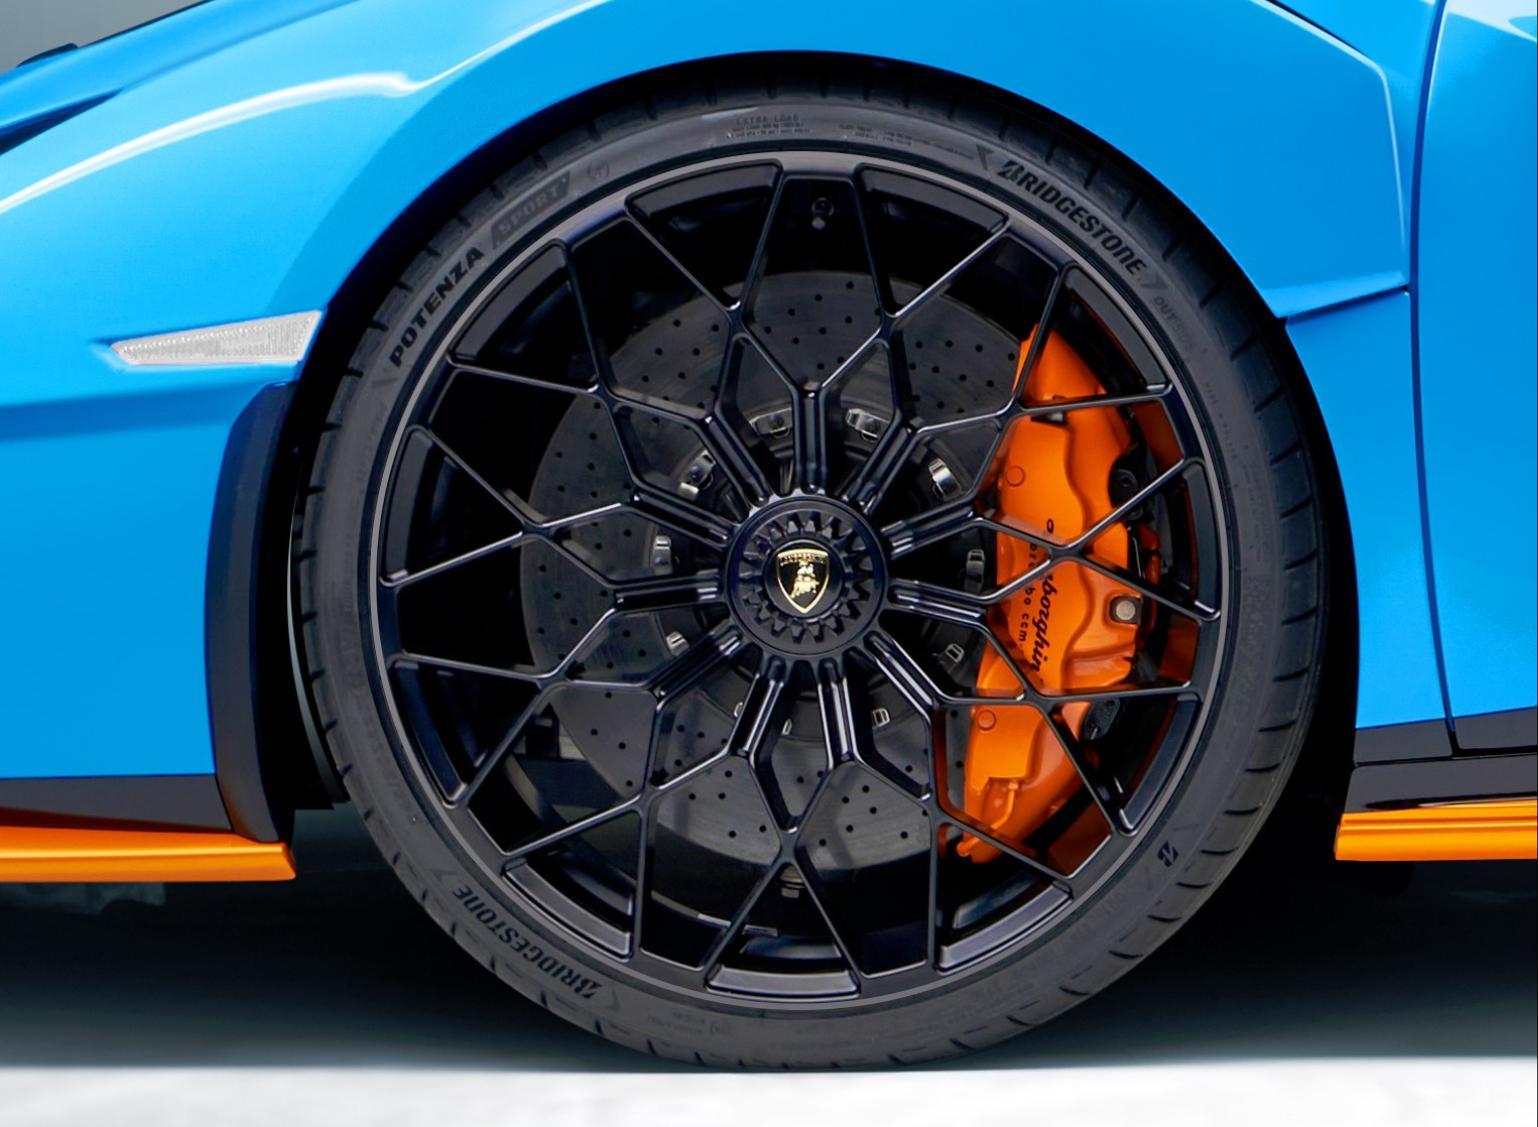 Bridgestone ได้รับเลือกจาก Lamborghini ให้เป็นยางติดรถซุปเปอร์คาร์ Huracán STO